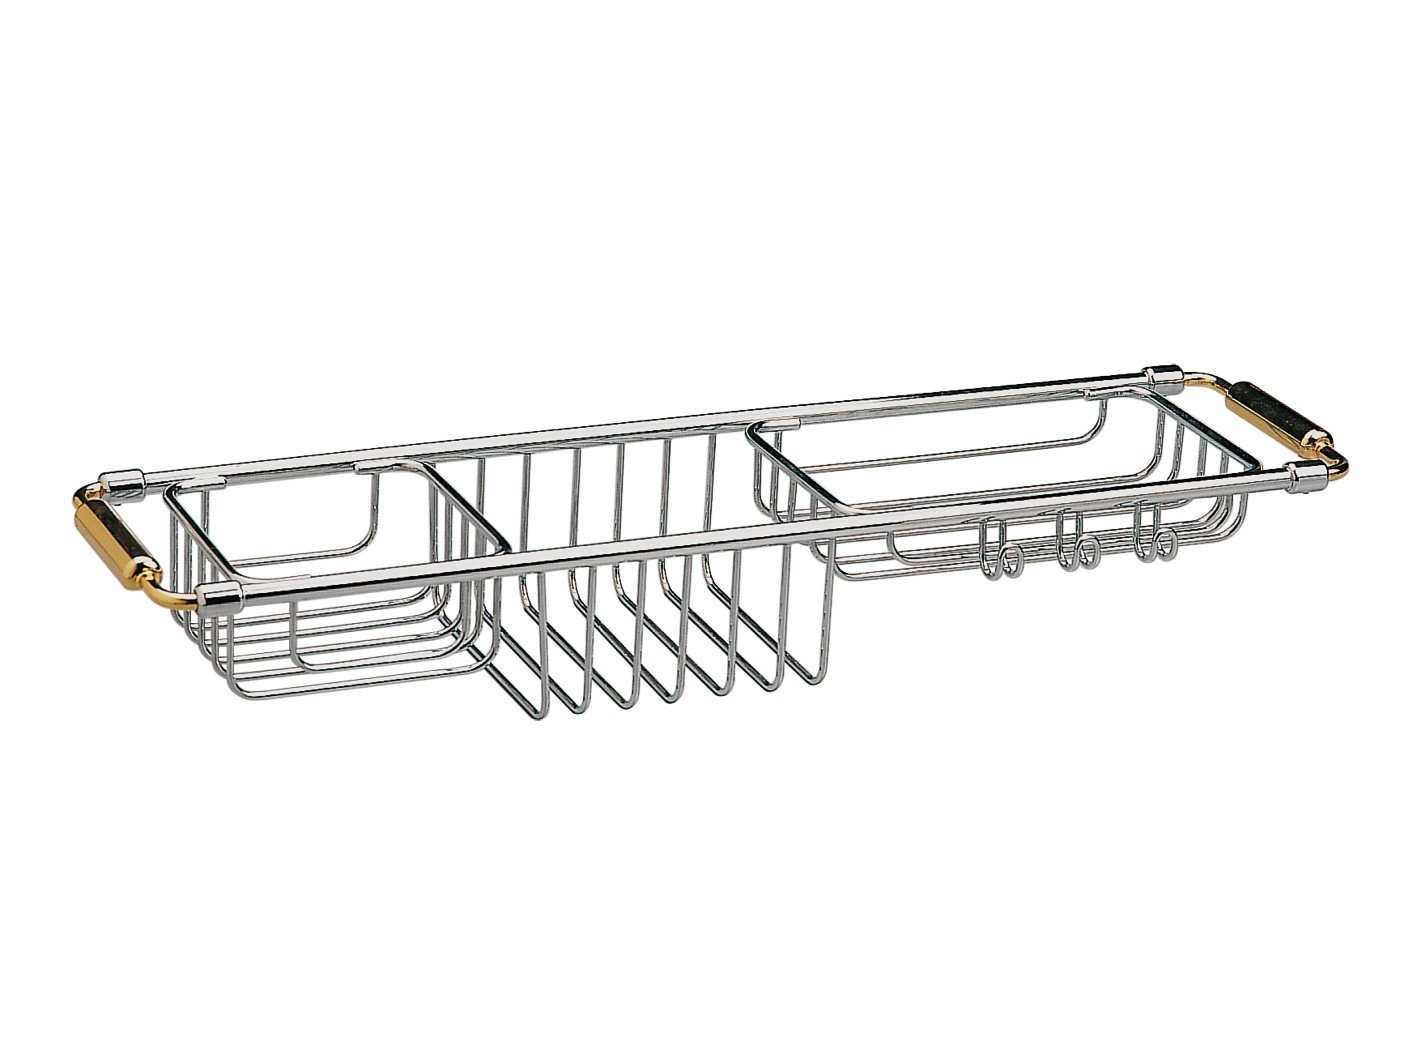 Bathtub Caddy Tray with Extending Sides Tub Tray Holder Rack Bath Storage, Brass (Polished Chrome)